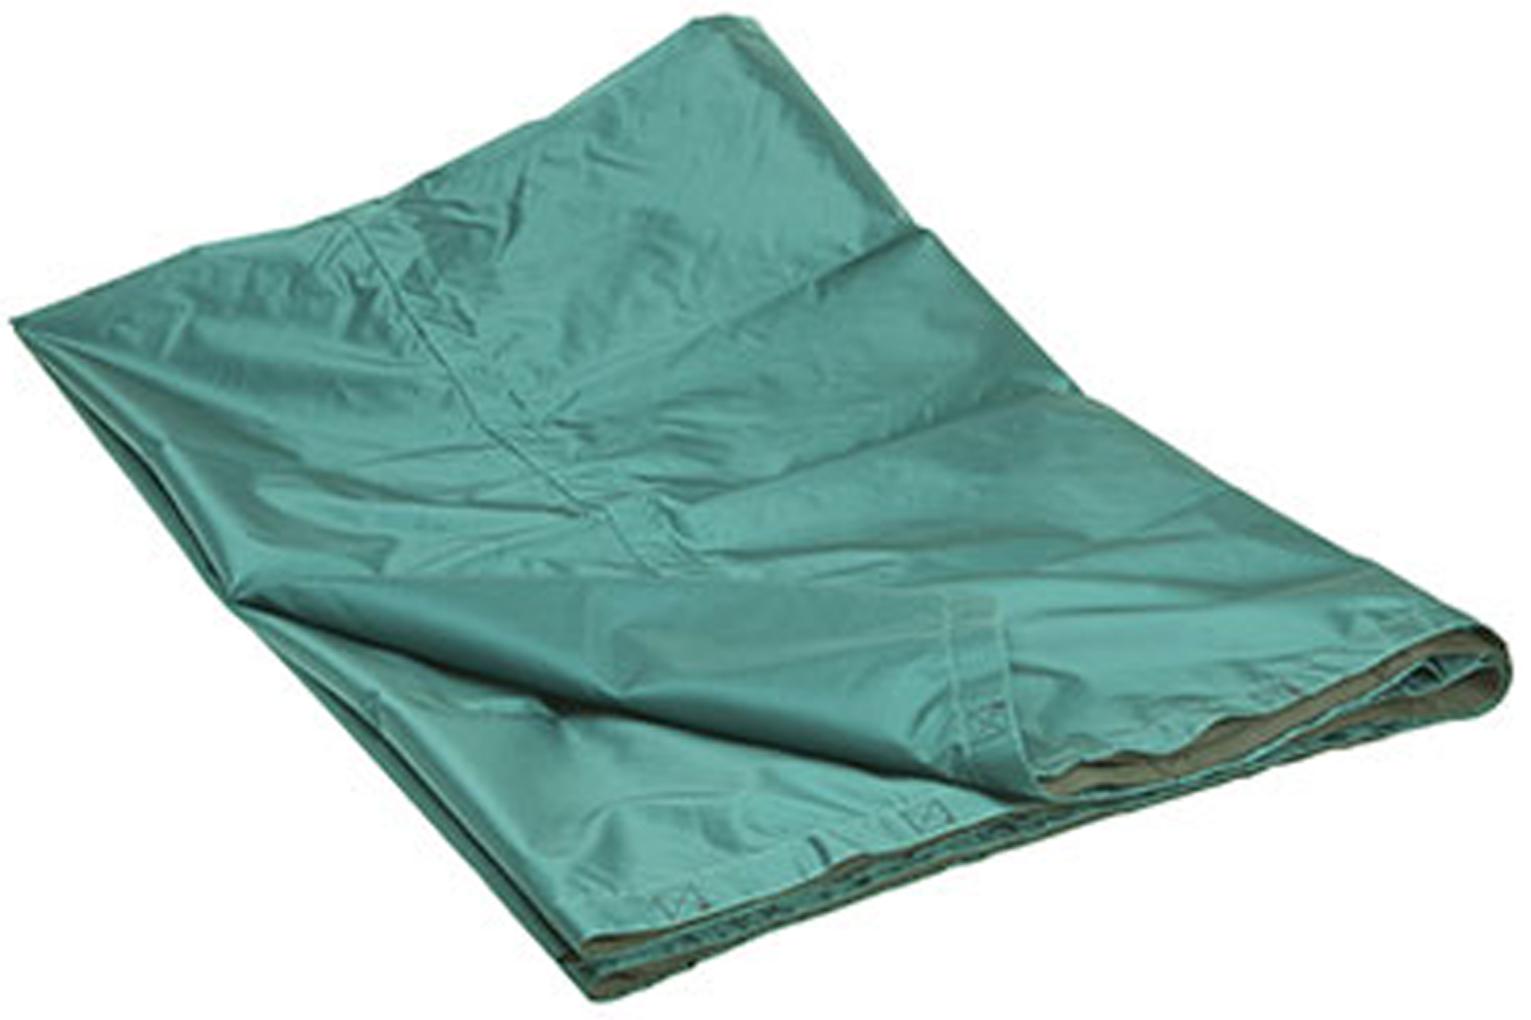 Mangar lifting cushion slide sheet